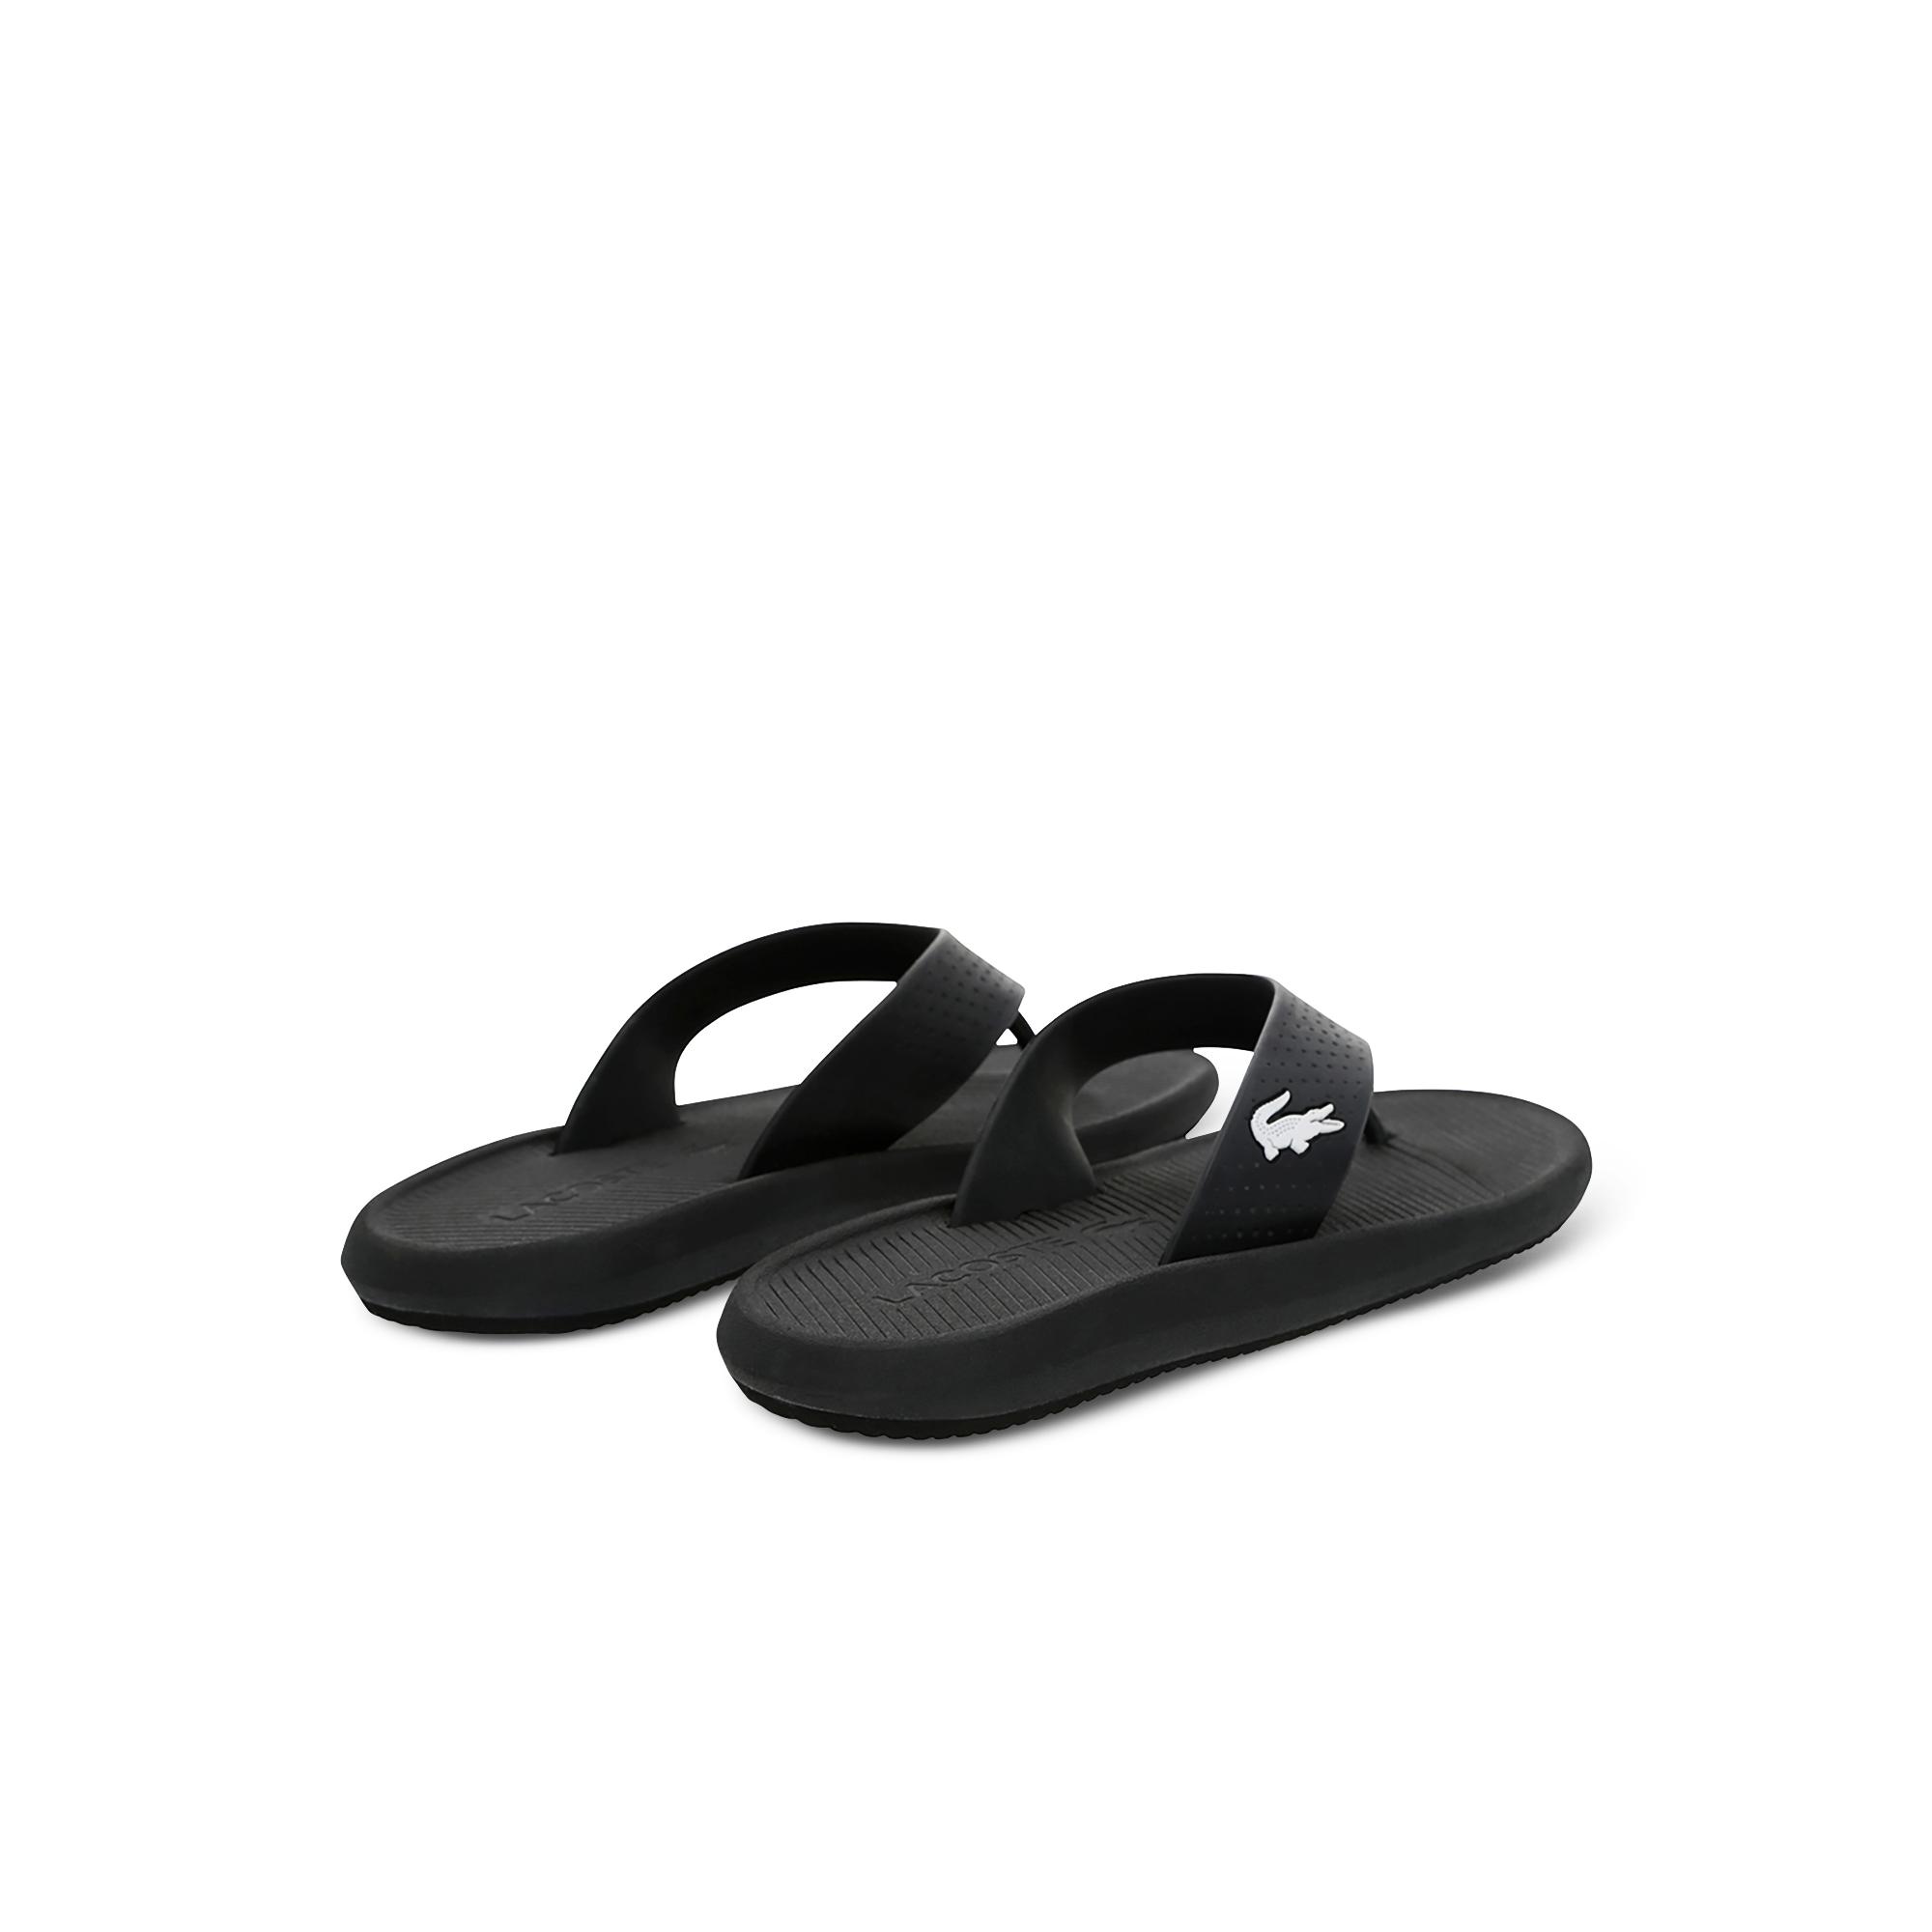 Lacoste Croco Sandal 219 1 Męskie Slippers